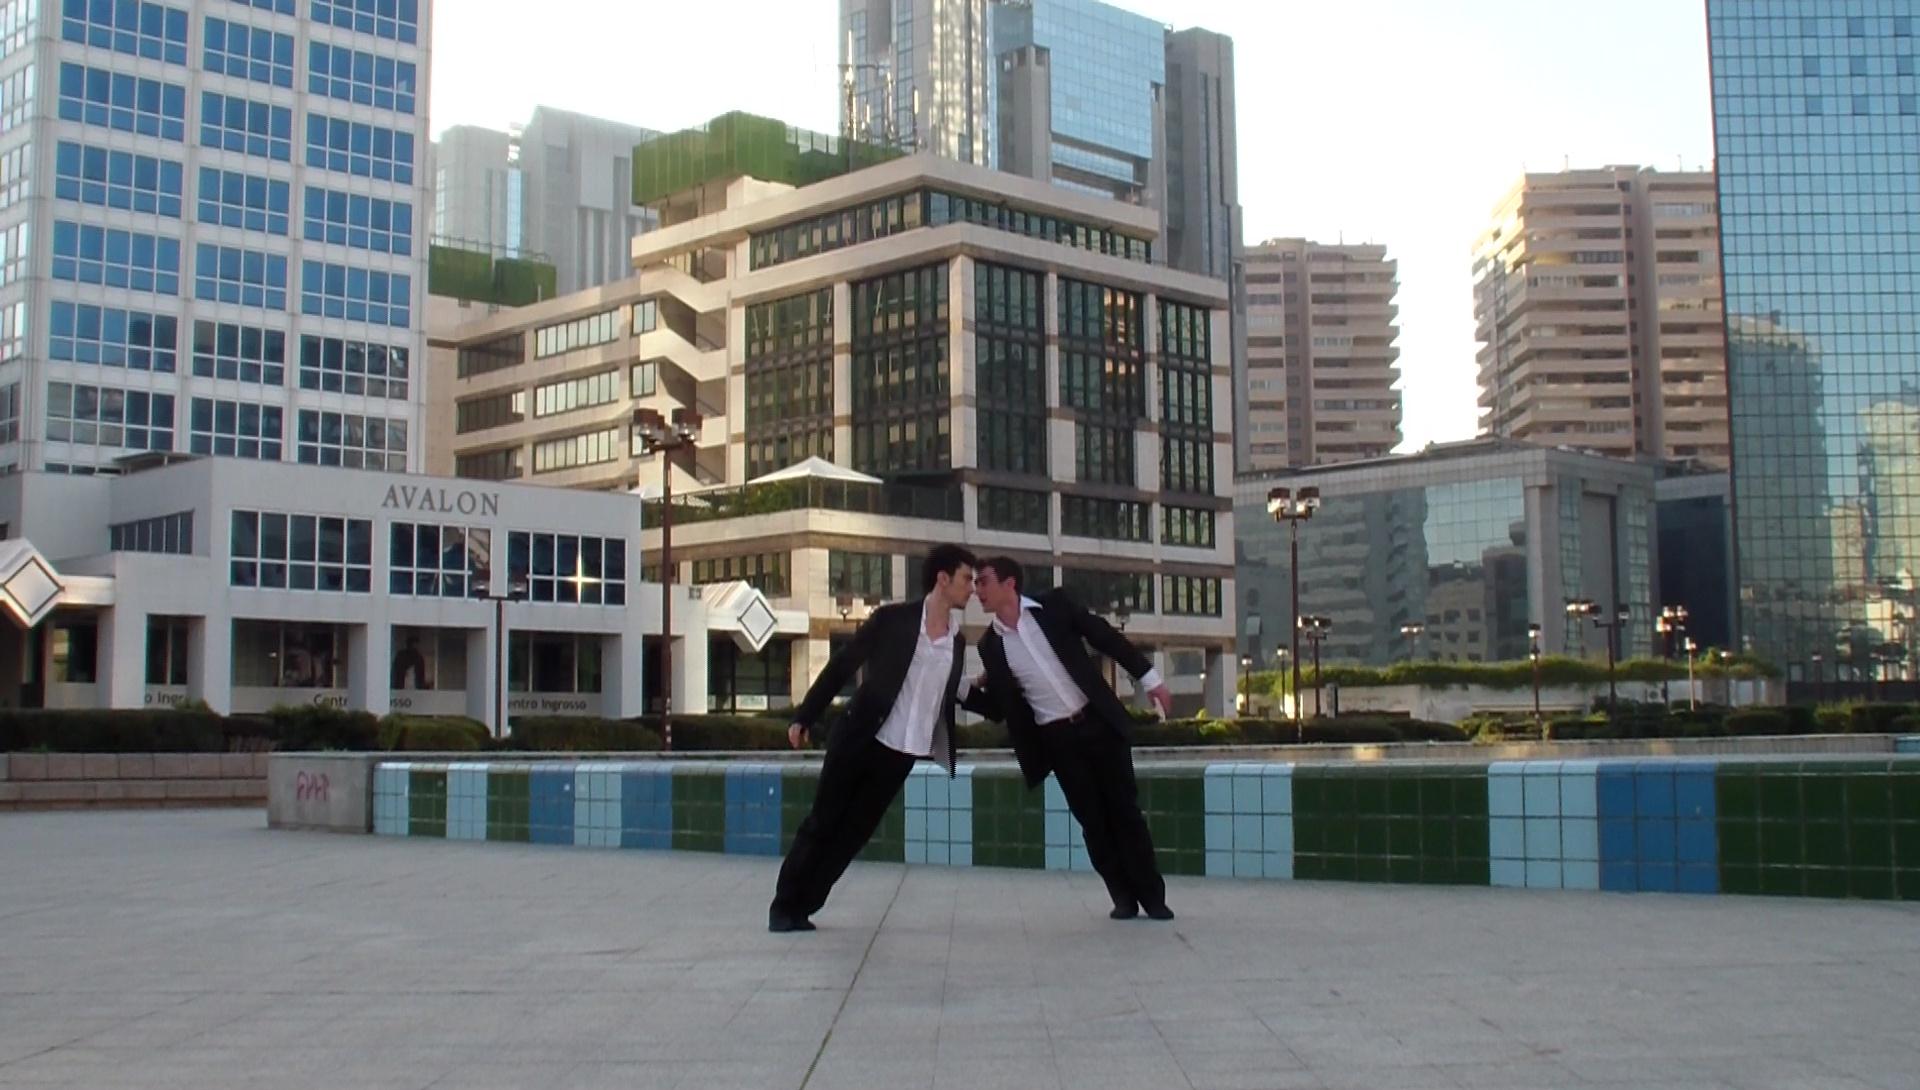 danza urbana bologna